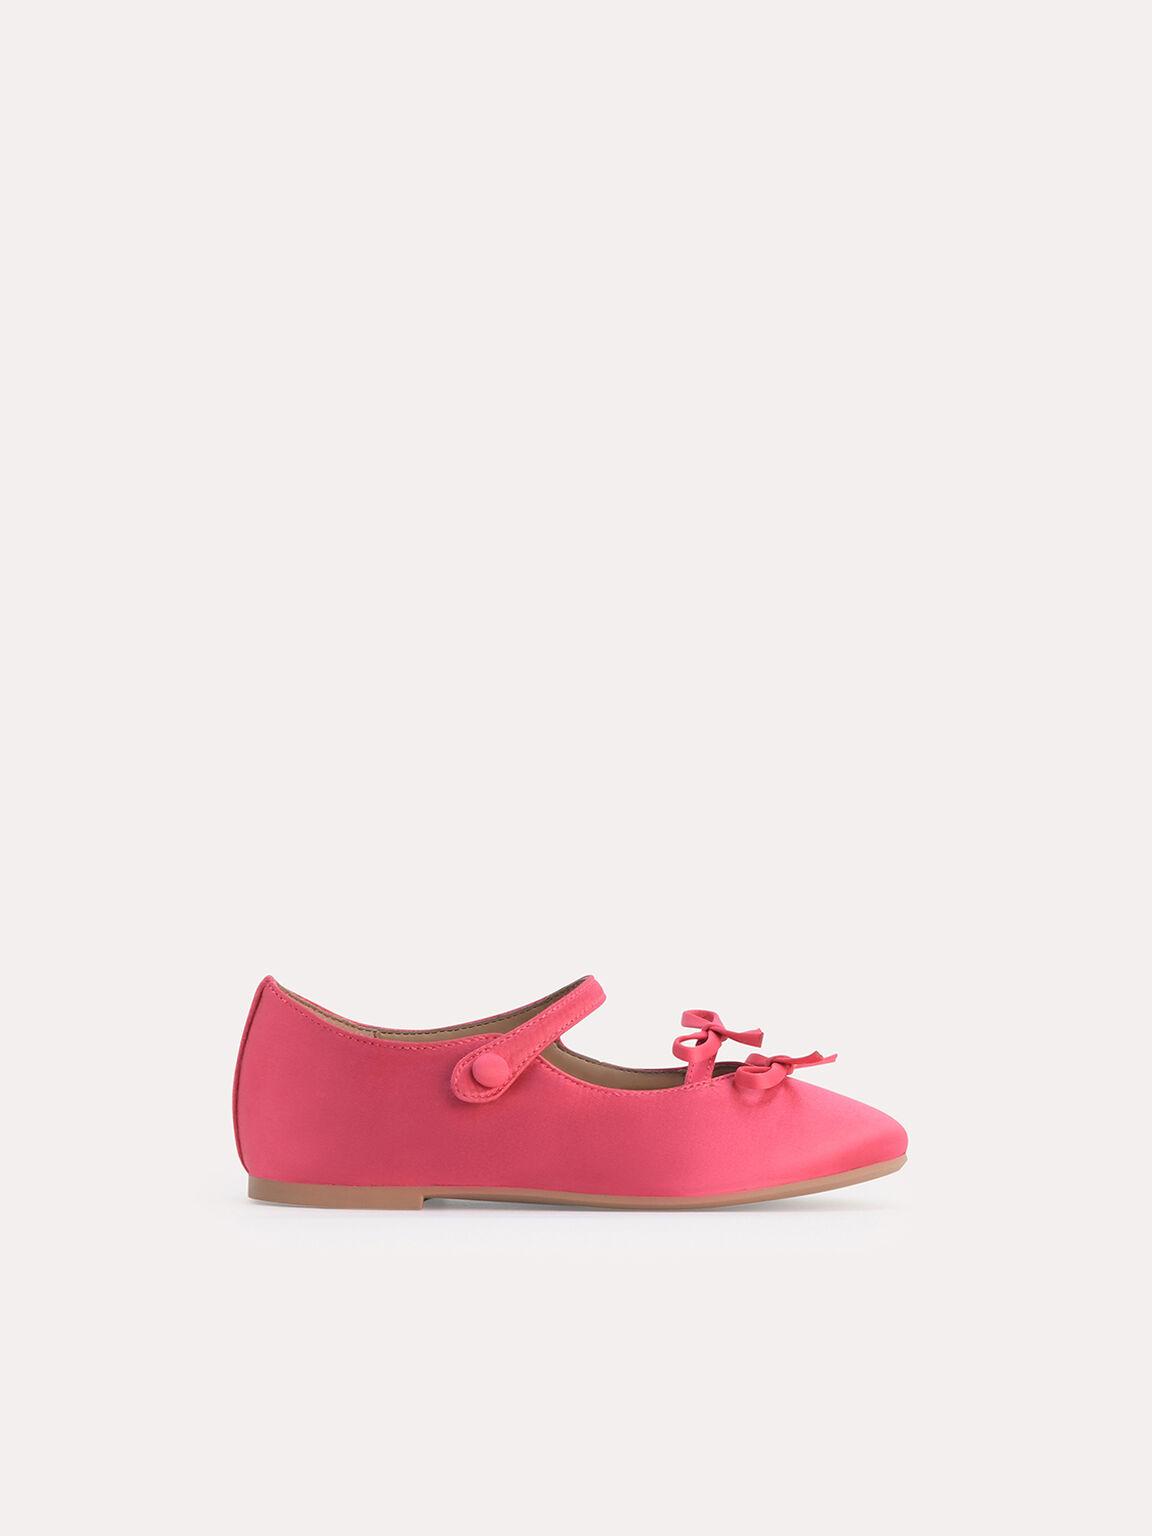 Double Bow Ballerina Flats, Coral Pink, hi-res